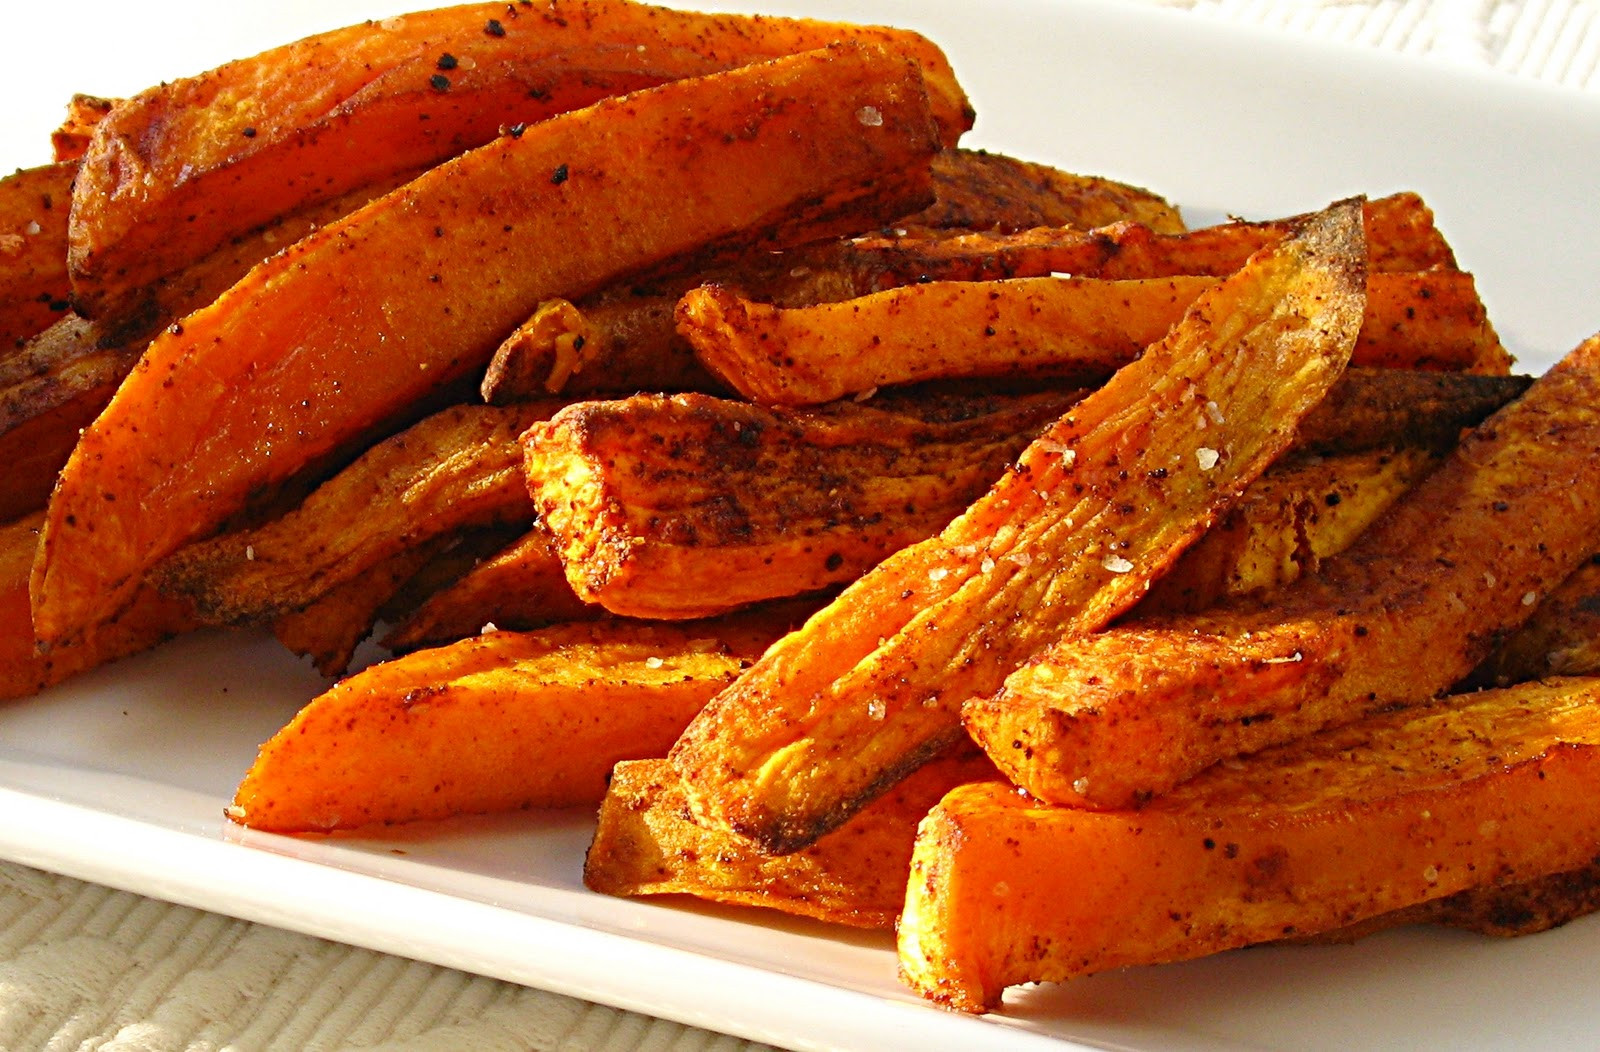 Sweet Potato Oven Fries  All That Splatters Sweet Potato Oven Fries with Avocado Dip